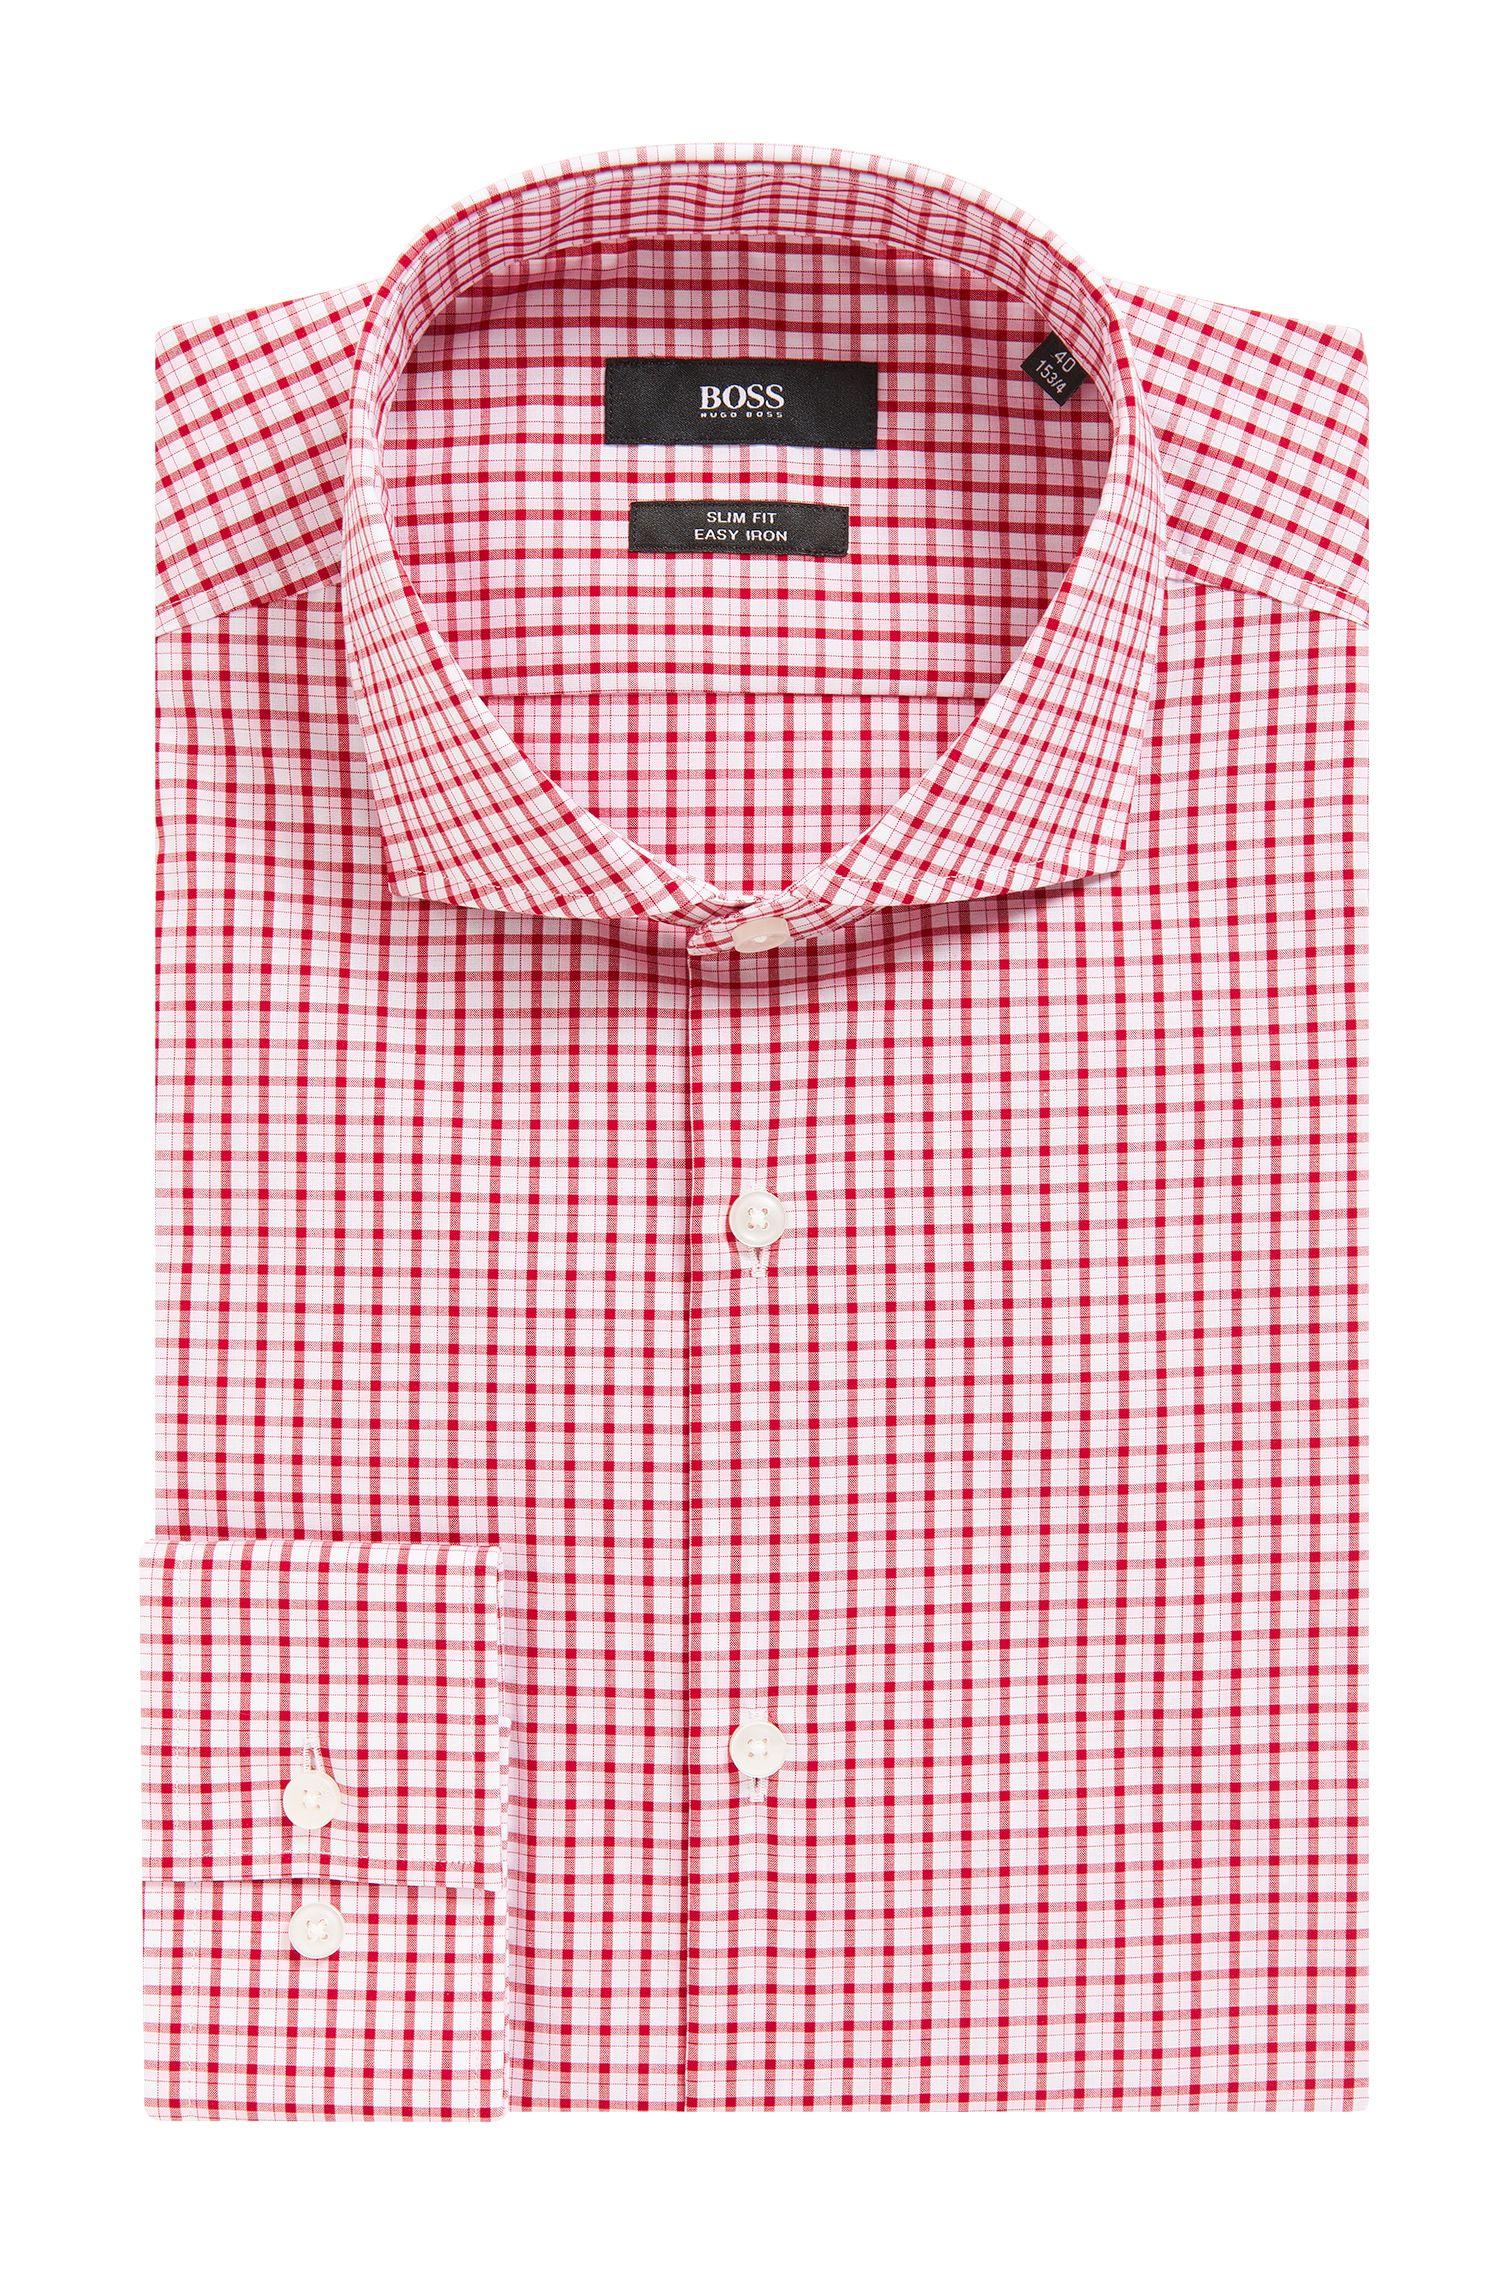 Checked Easy-Iron Slim Fit Cotton Dress Shirt | Jason